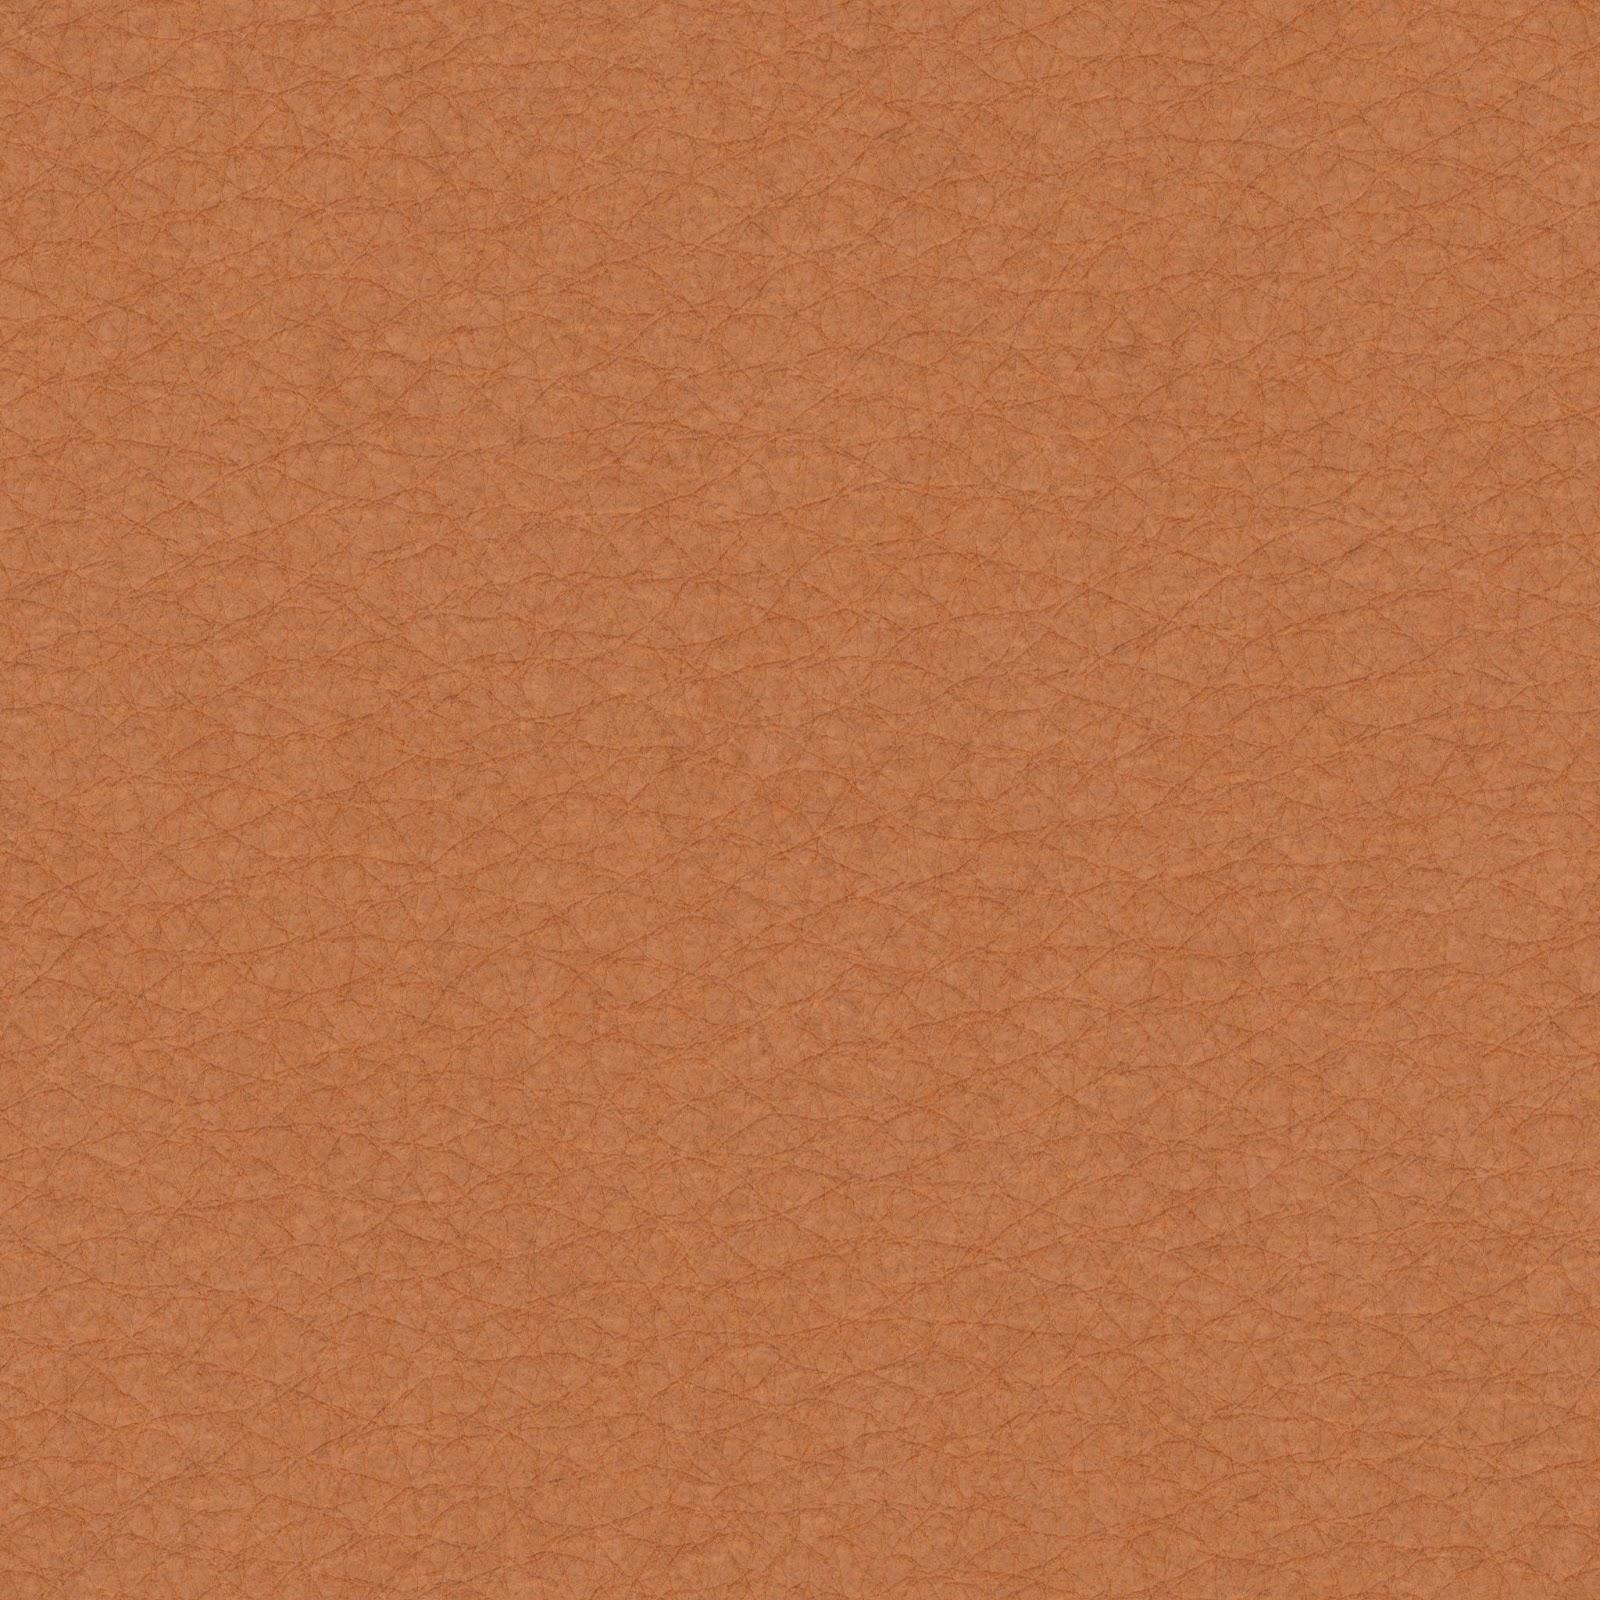 Tileable Human Skin Texture  9Orange Human Skin